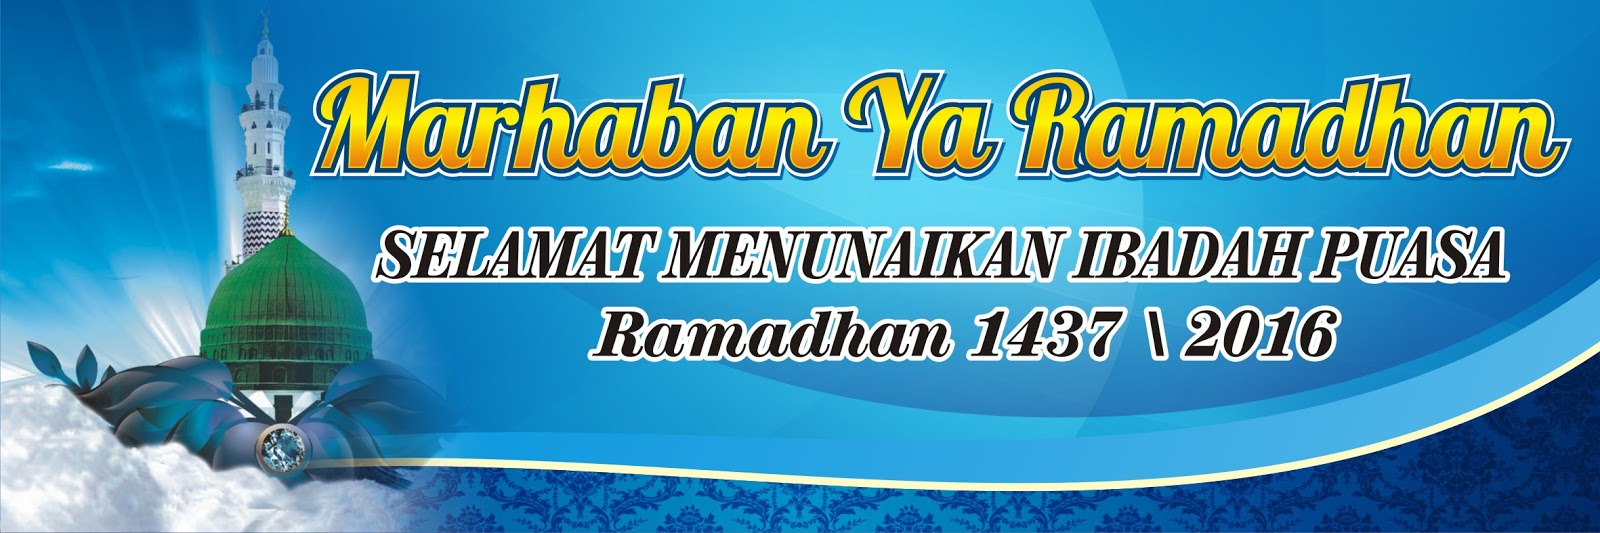 DAMEN ART: GRATIS! 3 Desain Spanduk Ramadhan 1437 H